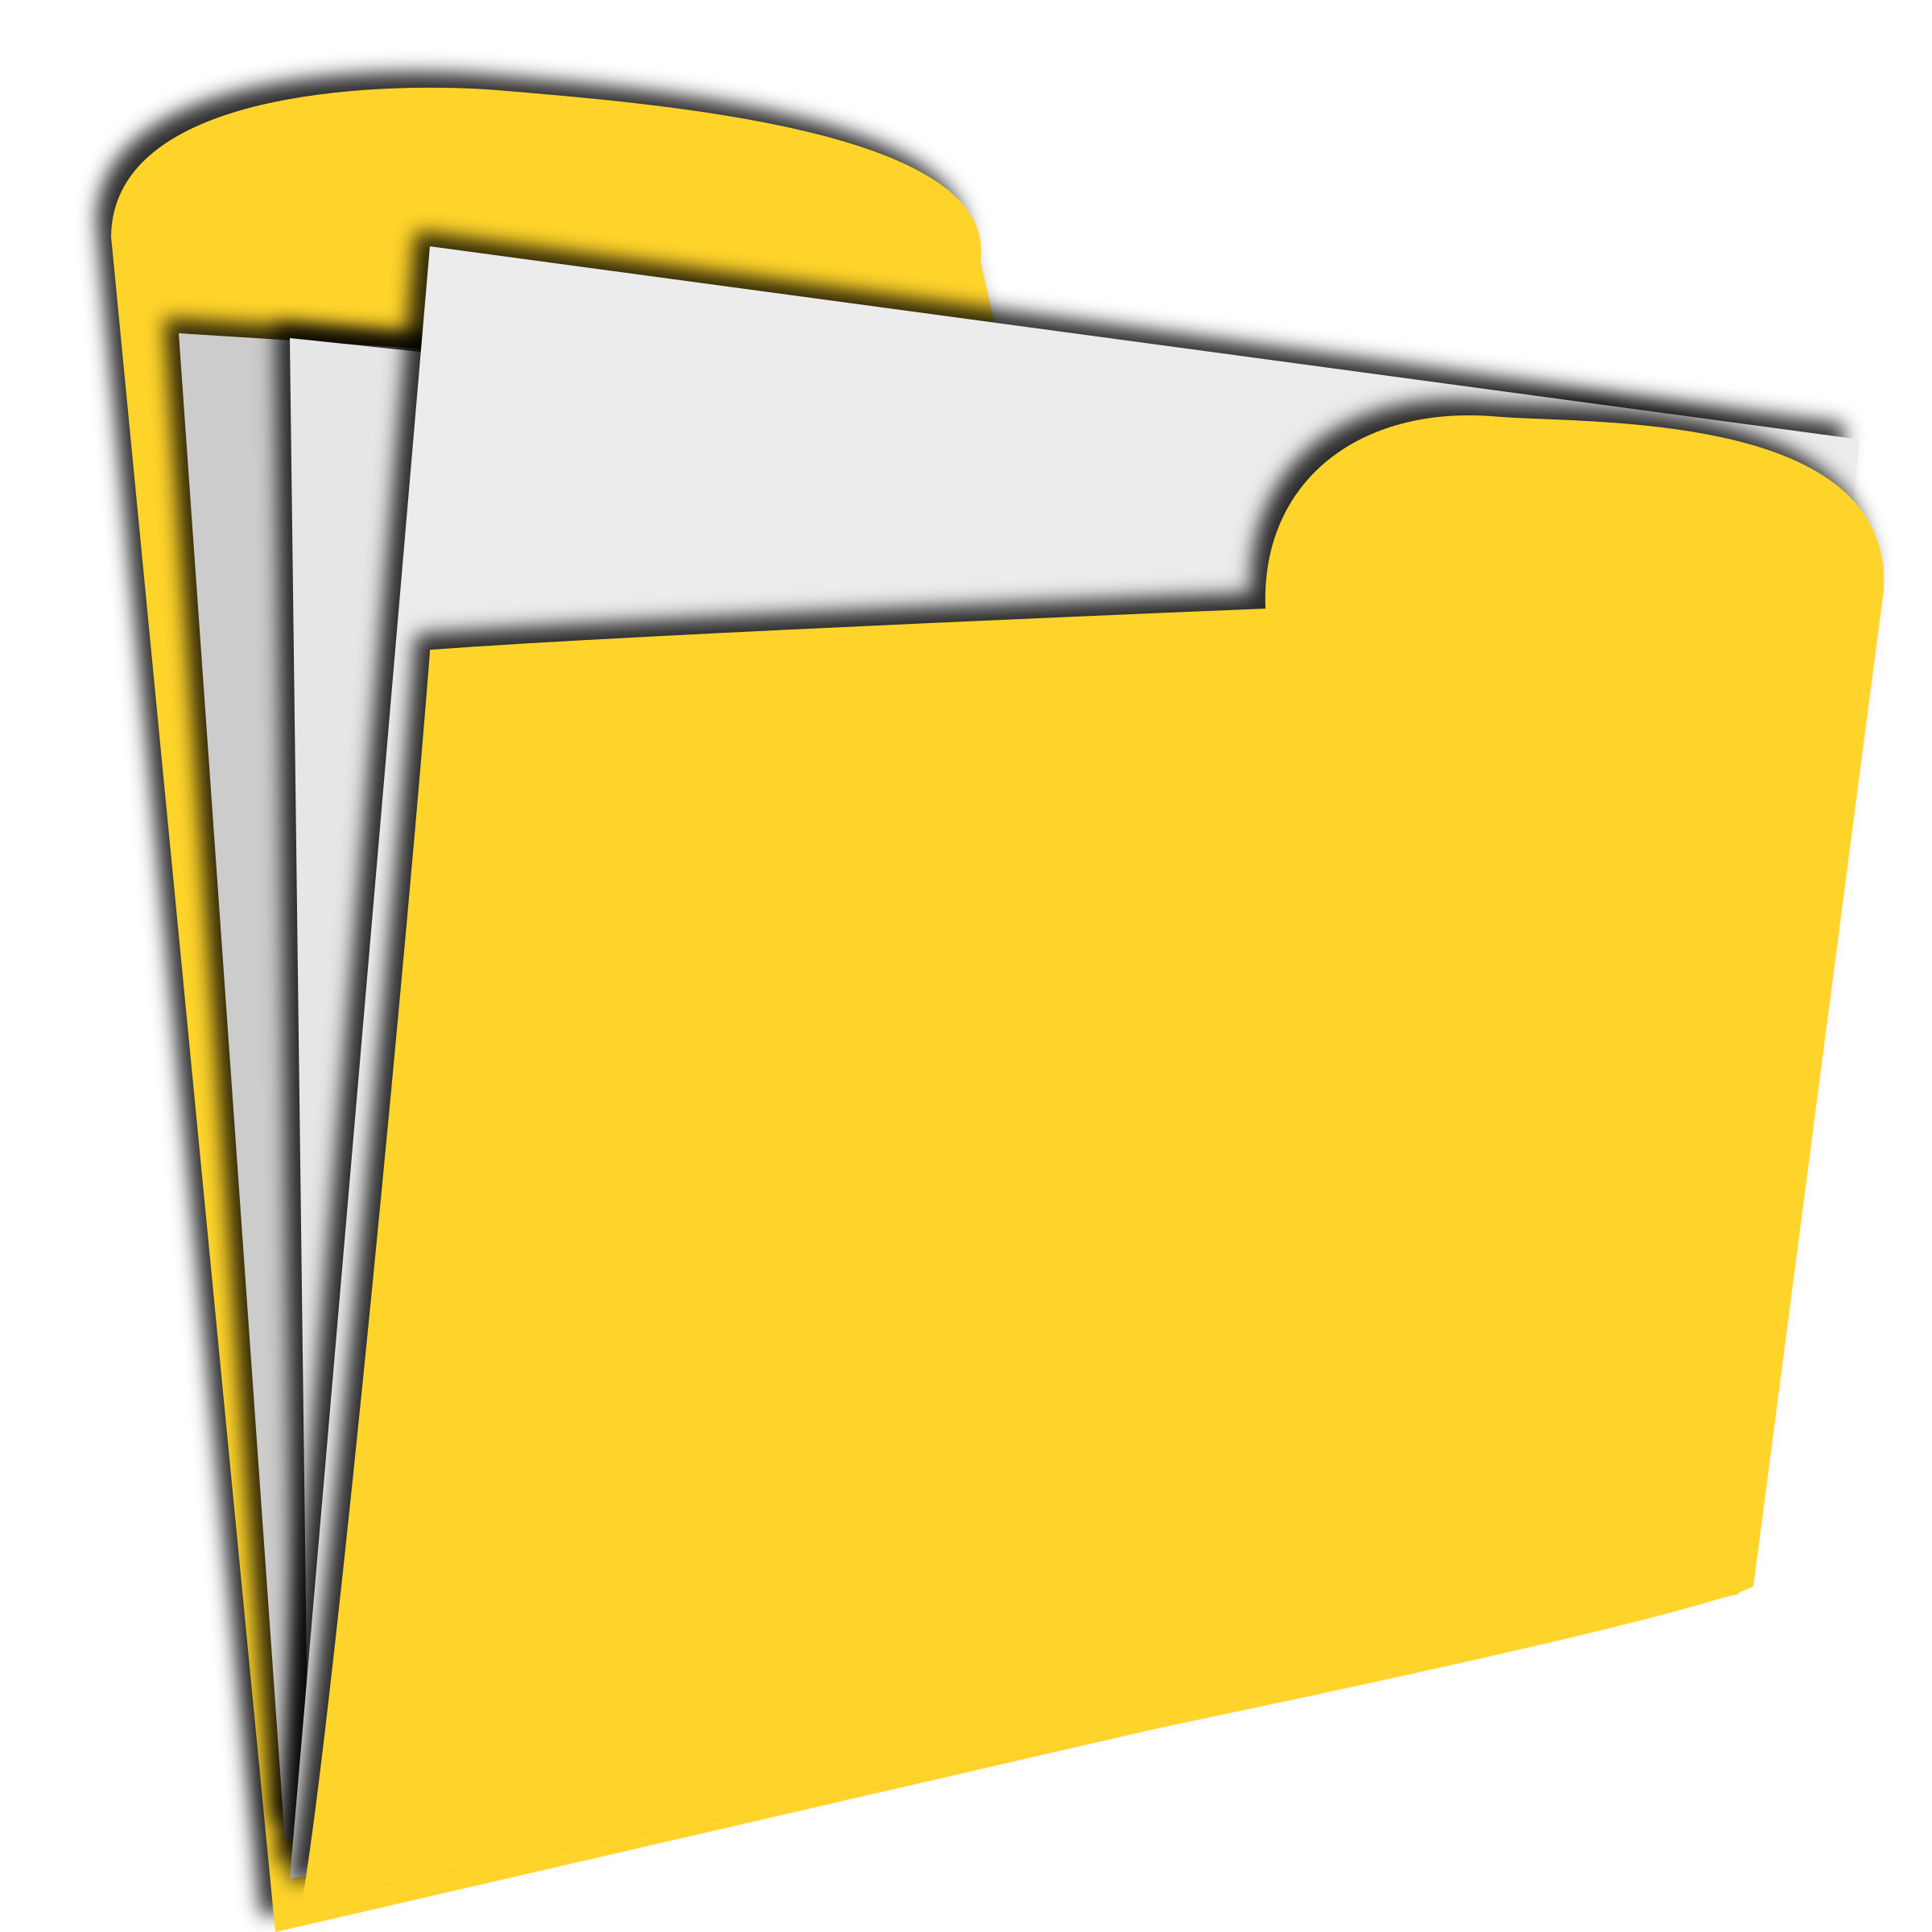 Folder clipart documentation. Document free clip art